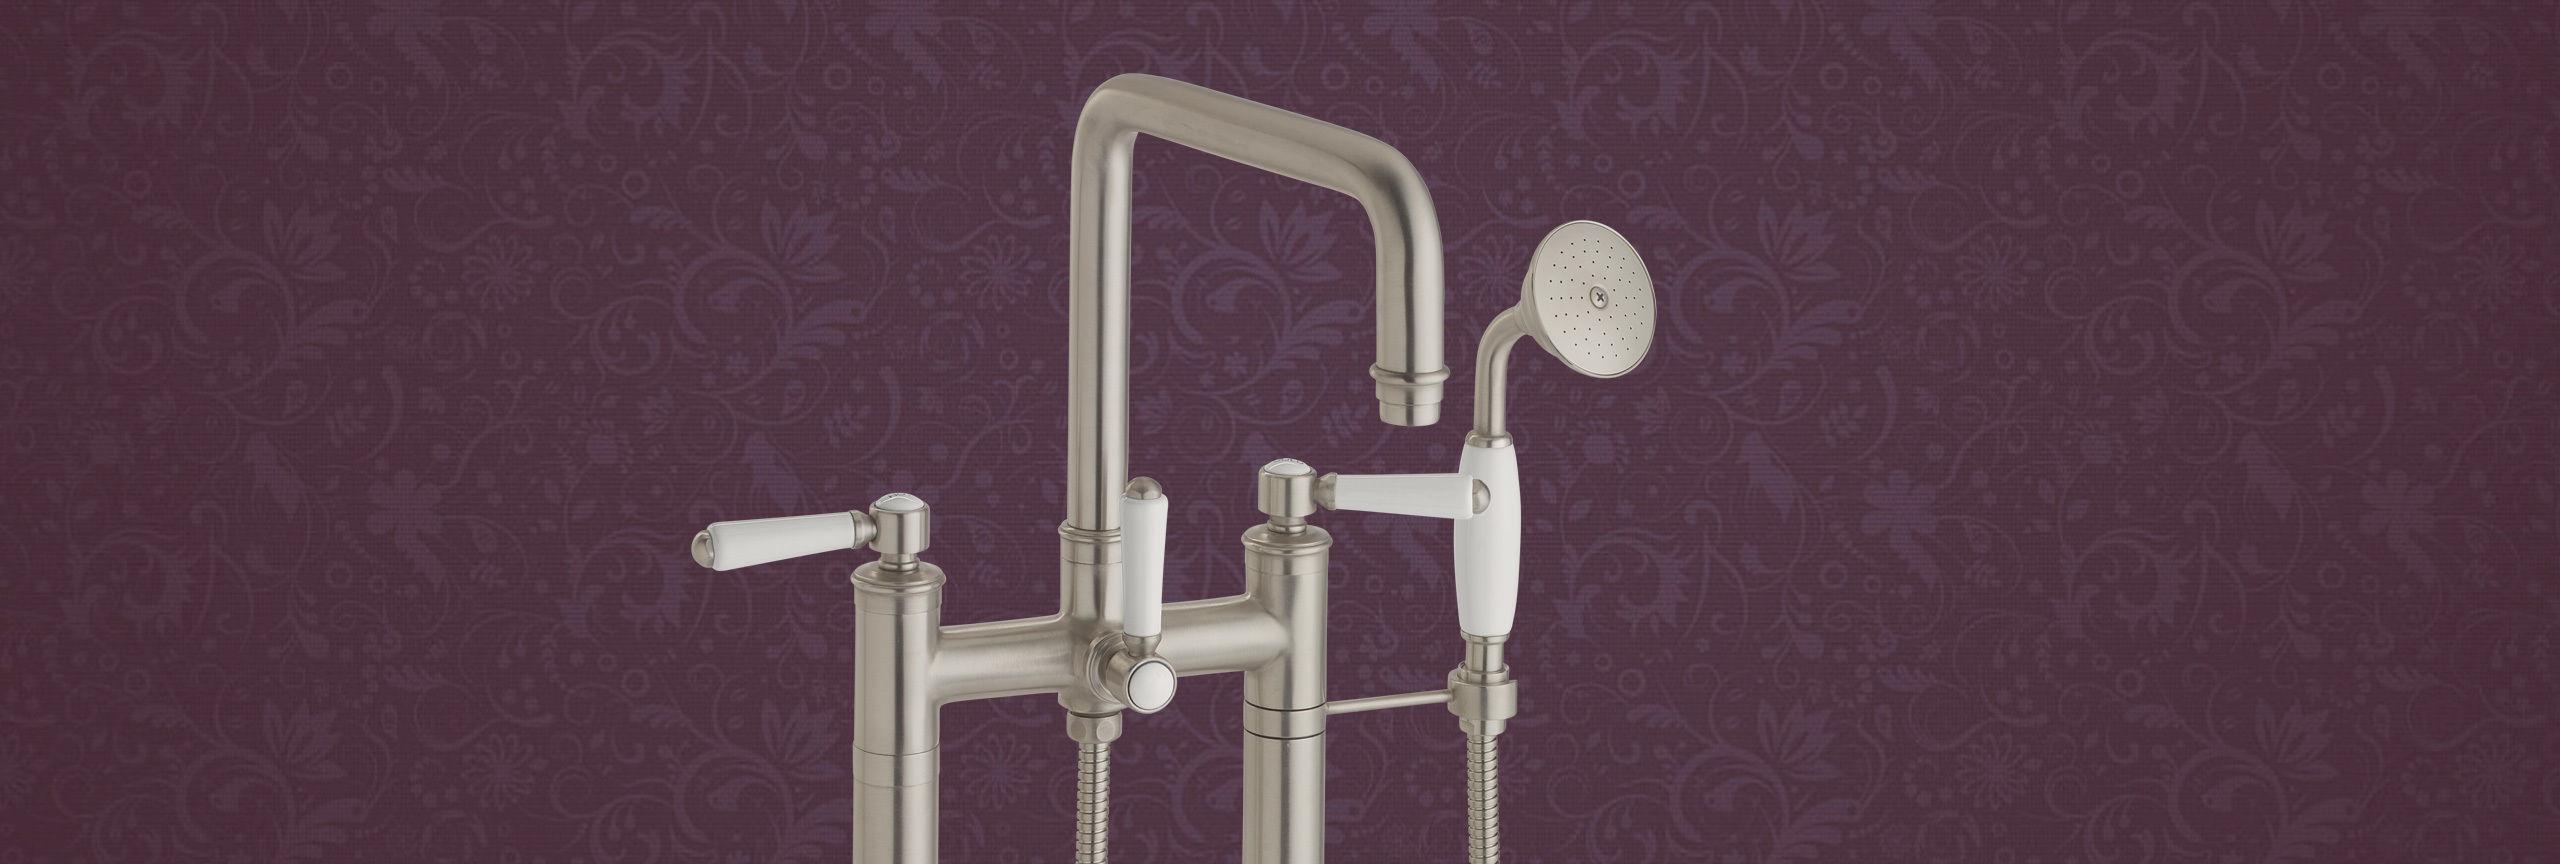 Bathroom series Hermosa tub filler floor mount